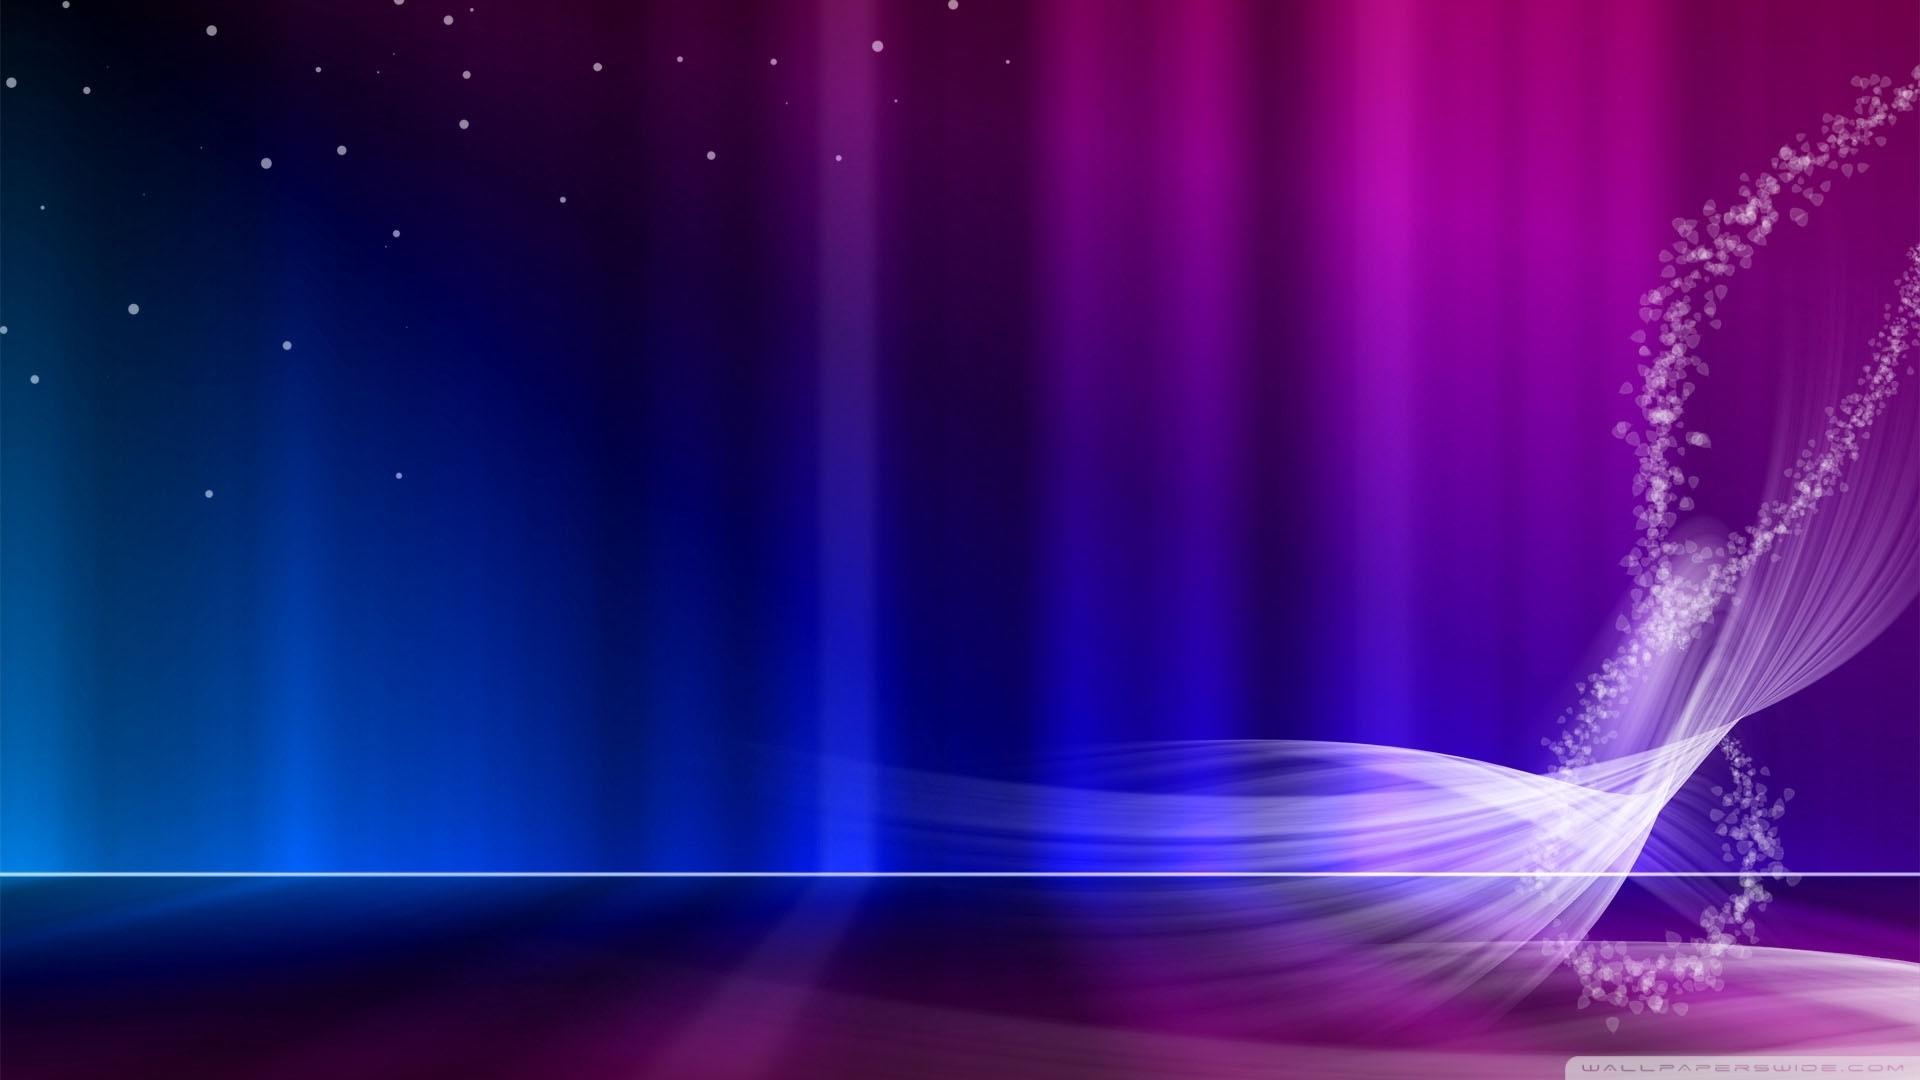 vista blue and purple aurora ❤ 4k hd desktop wallpaper for 4k ultra